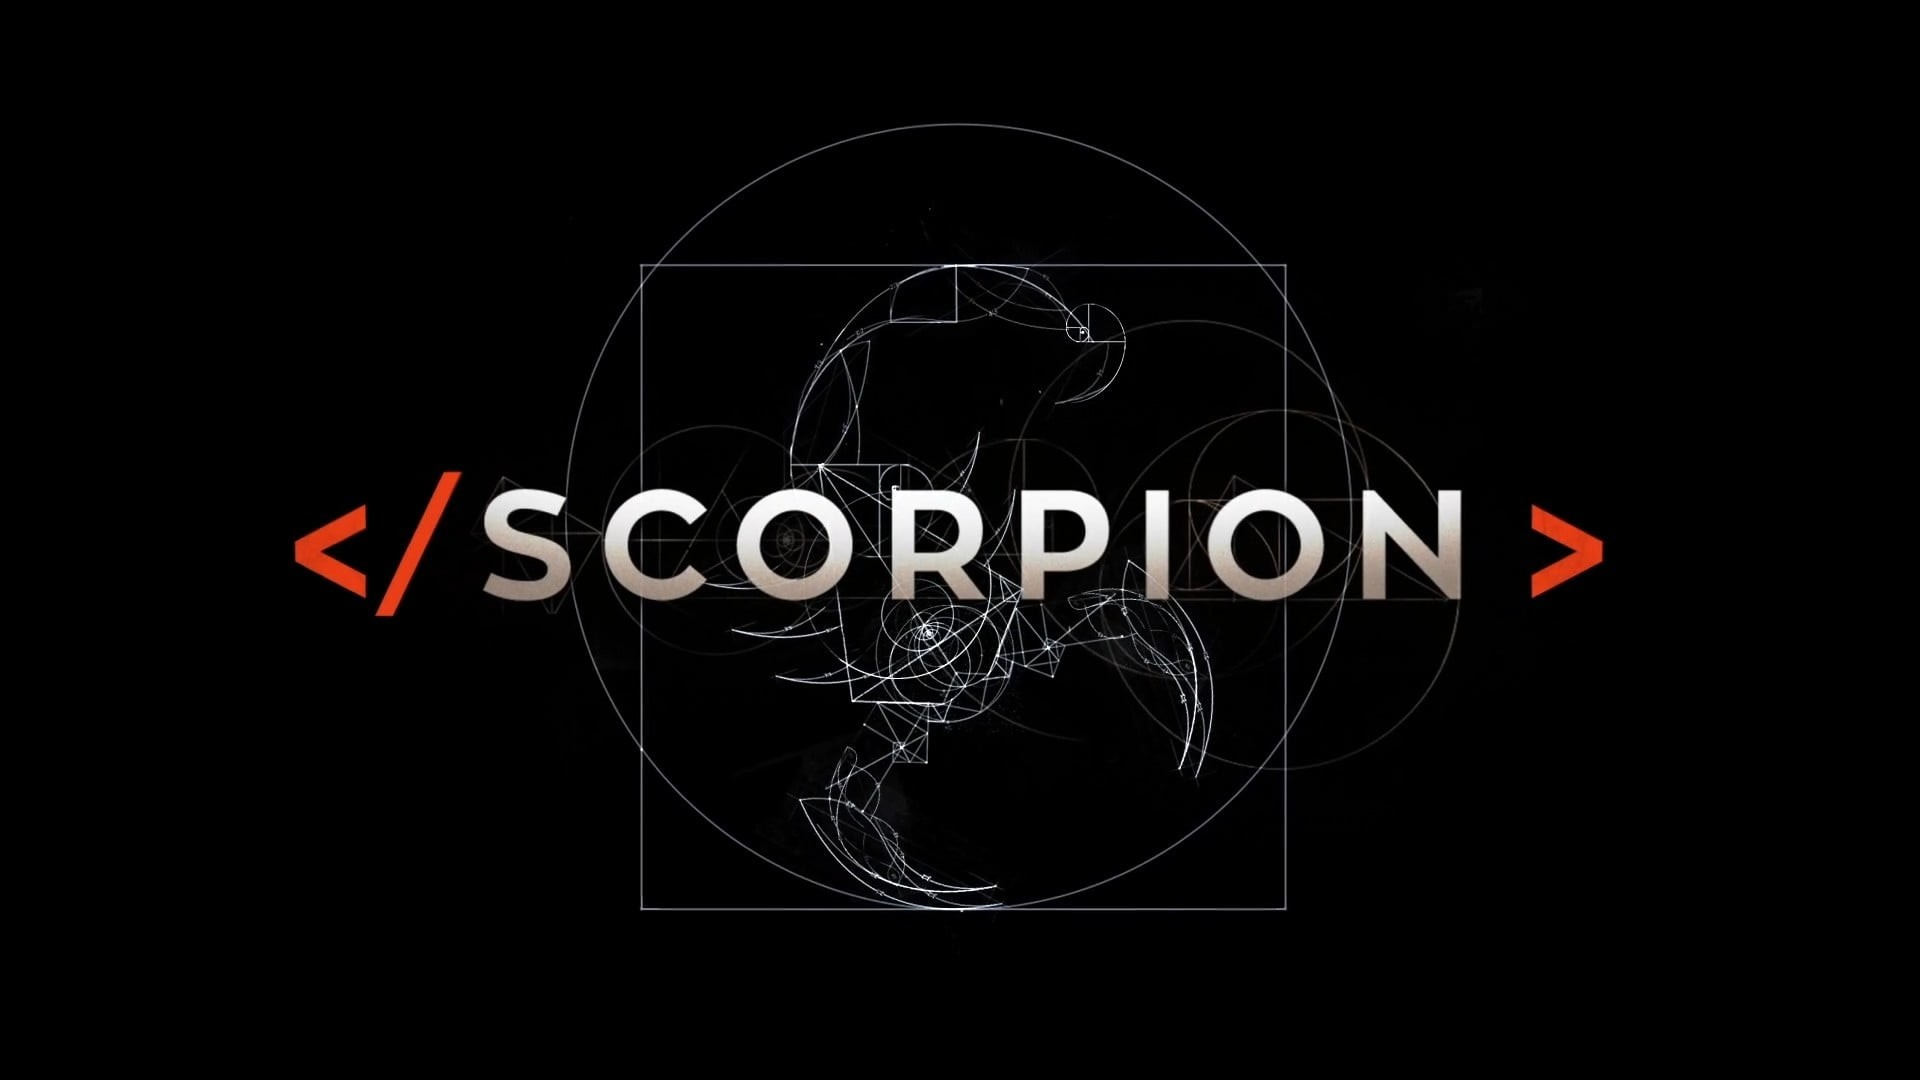 Res: 1920x1080, Scorpion Wallpaper 6 - 1920 X 1080